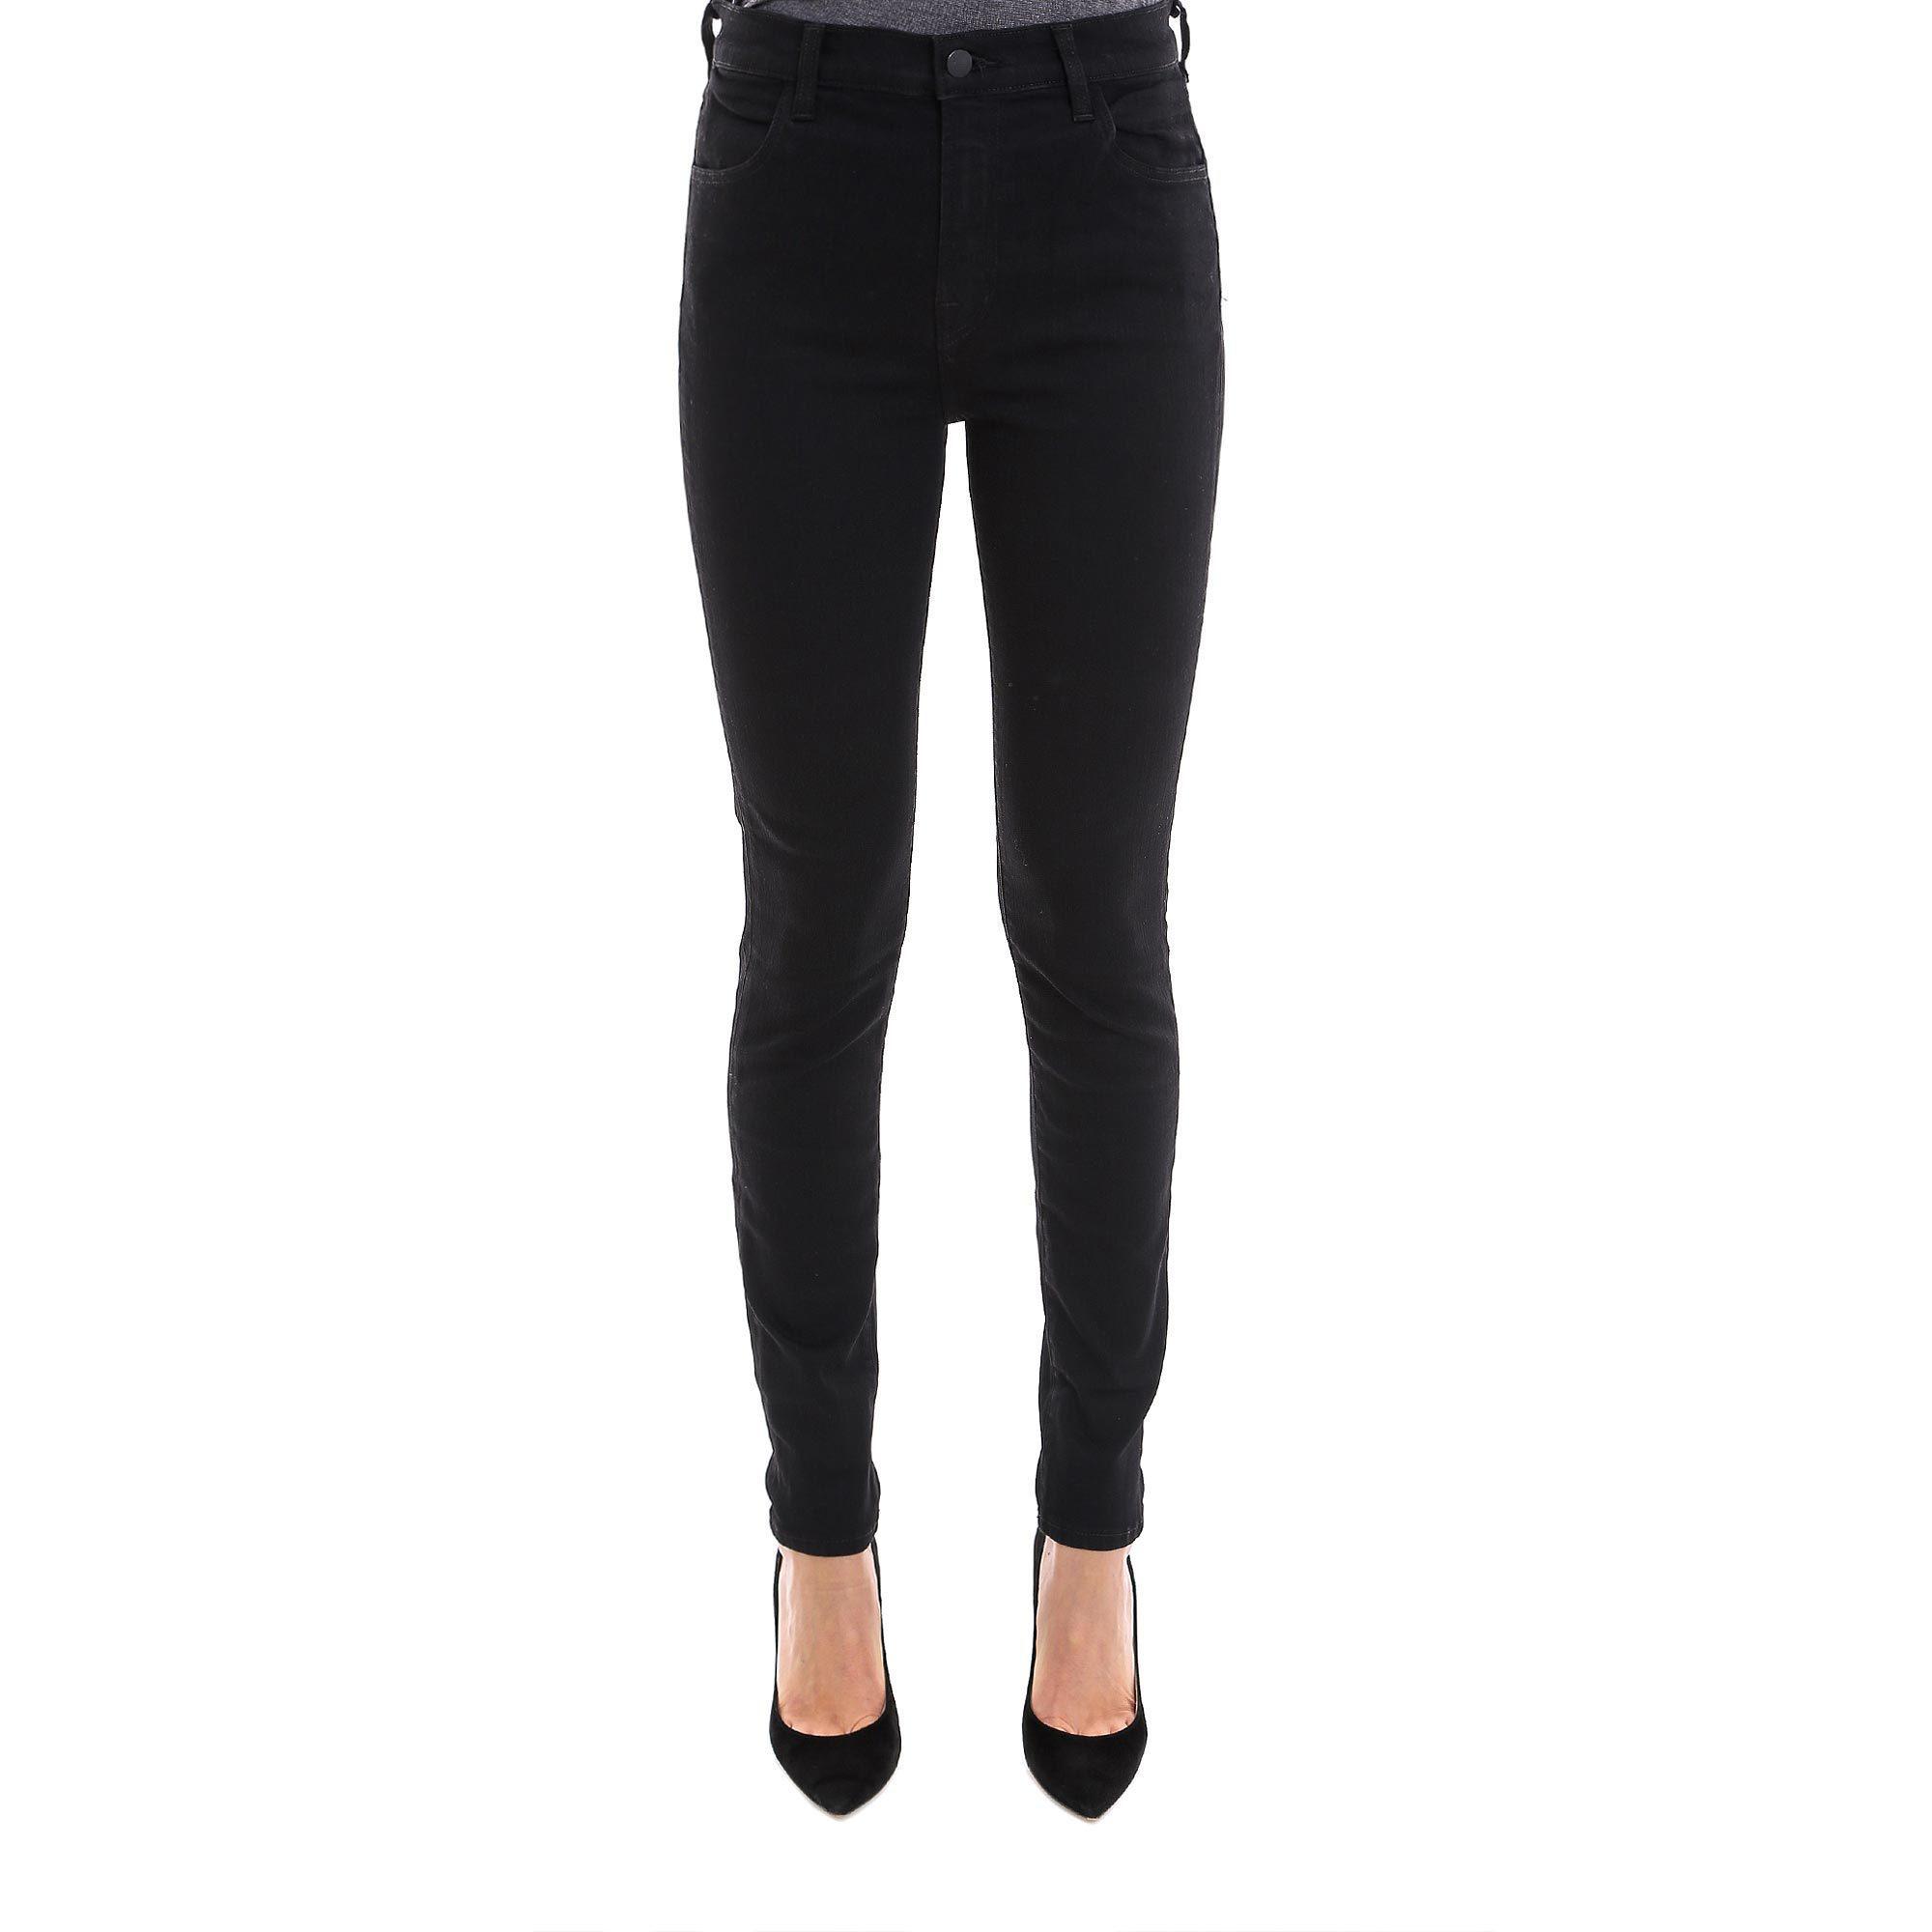 ea4a2ae37e28 J Brand Ripped Skinny Jeans in Black - Lyst